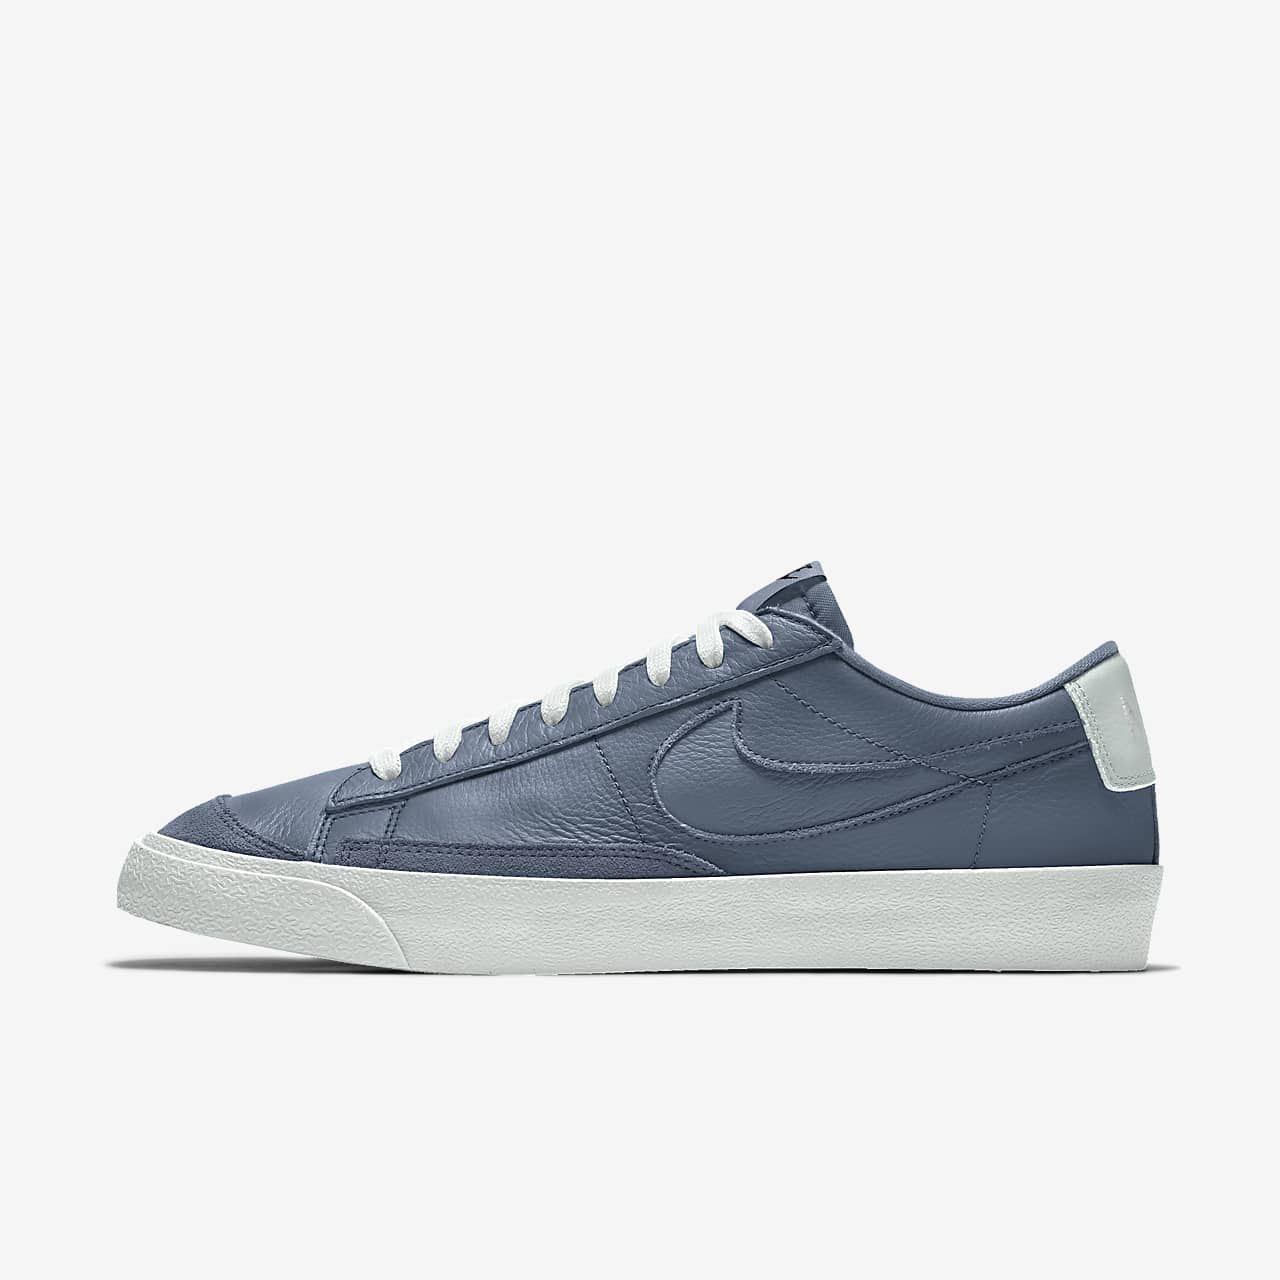 Nike Blazer Low '77 Vintage By You 专属定制运动鞋